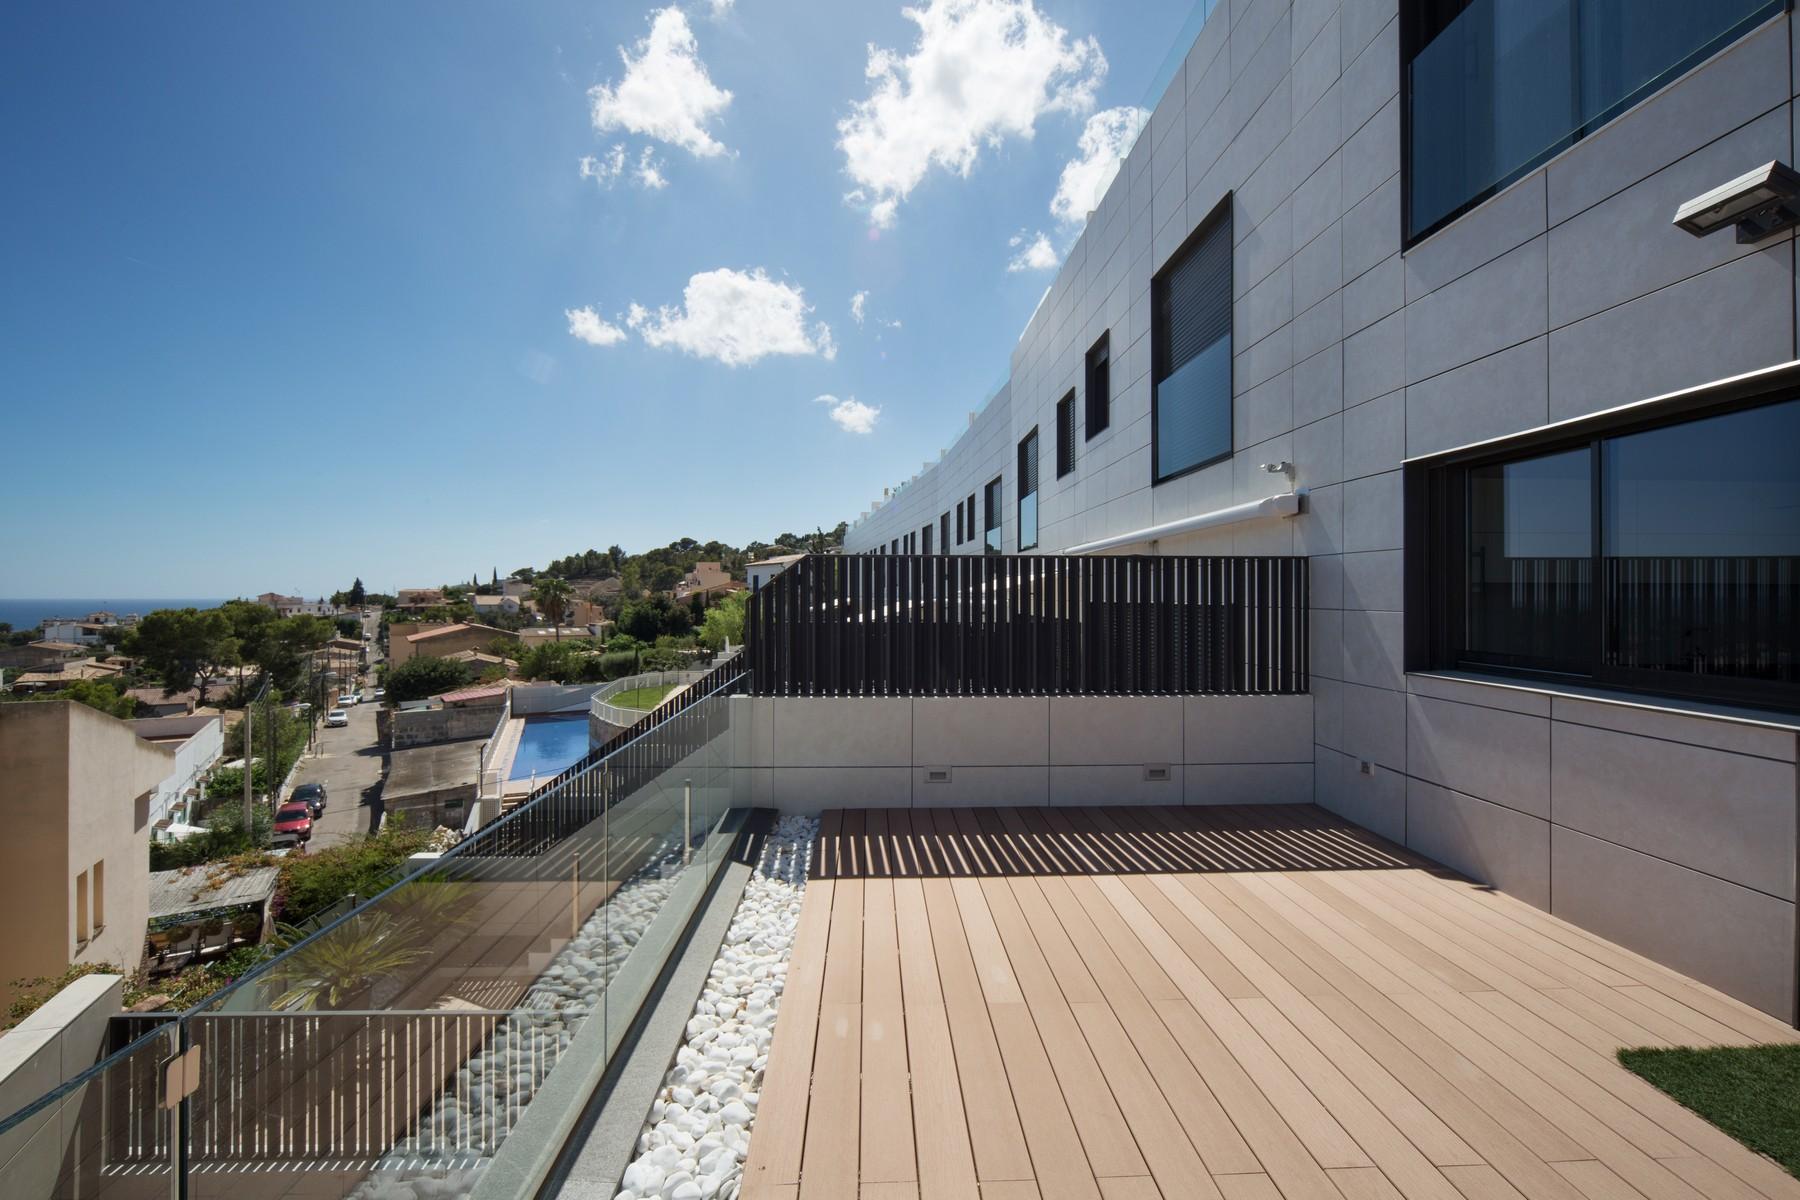 Single Family Home for Sale at Modern newly built semidetached villa in Génova Palma, Mallorca 07015 Spain